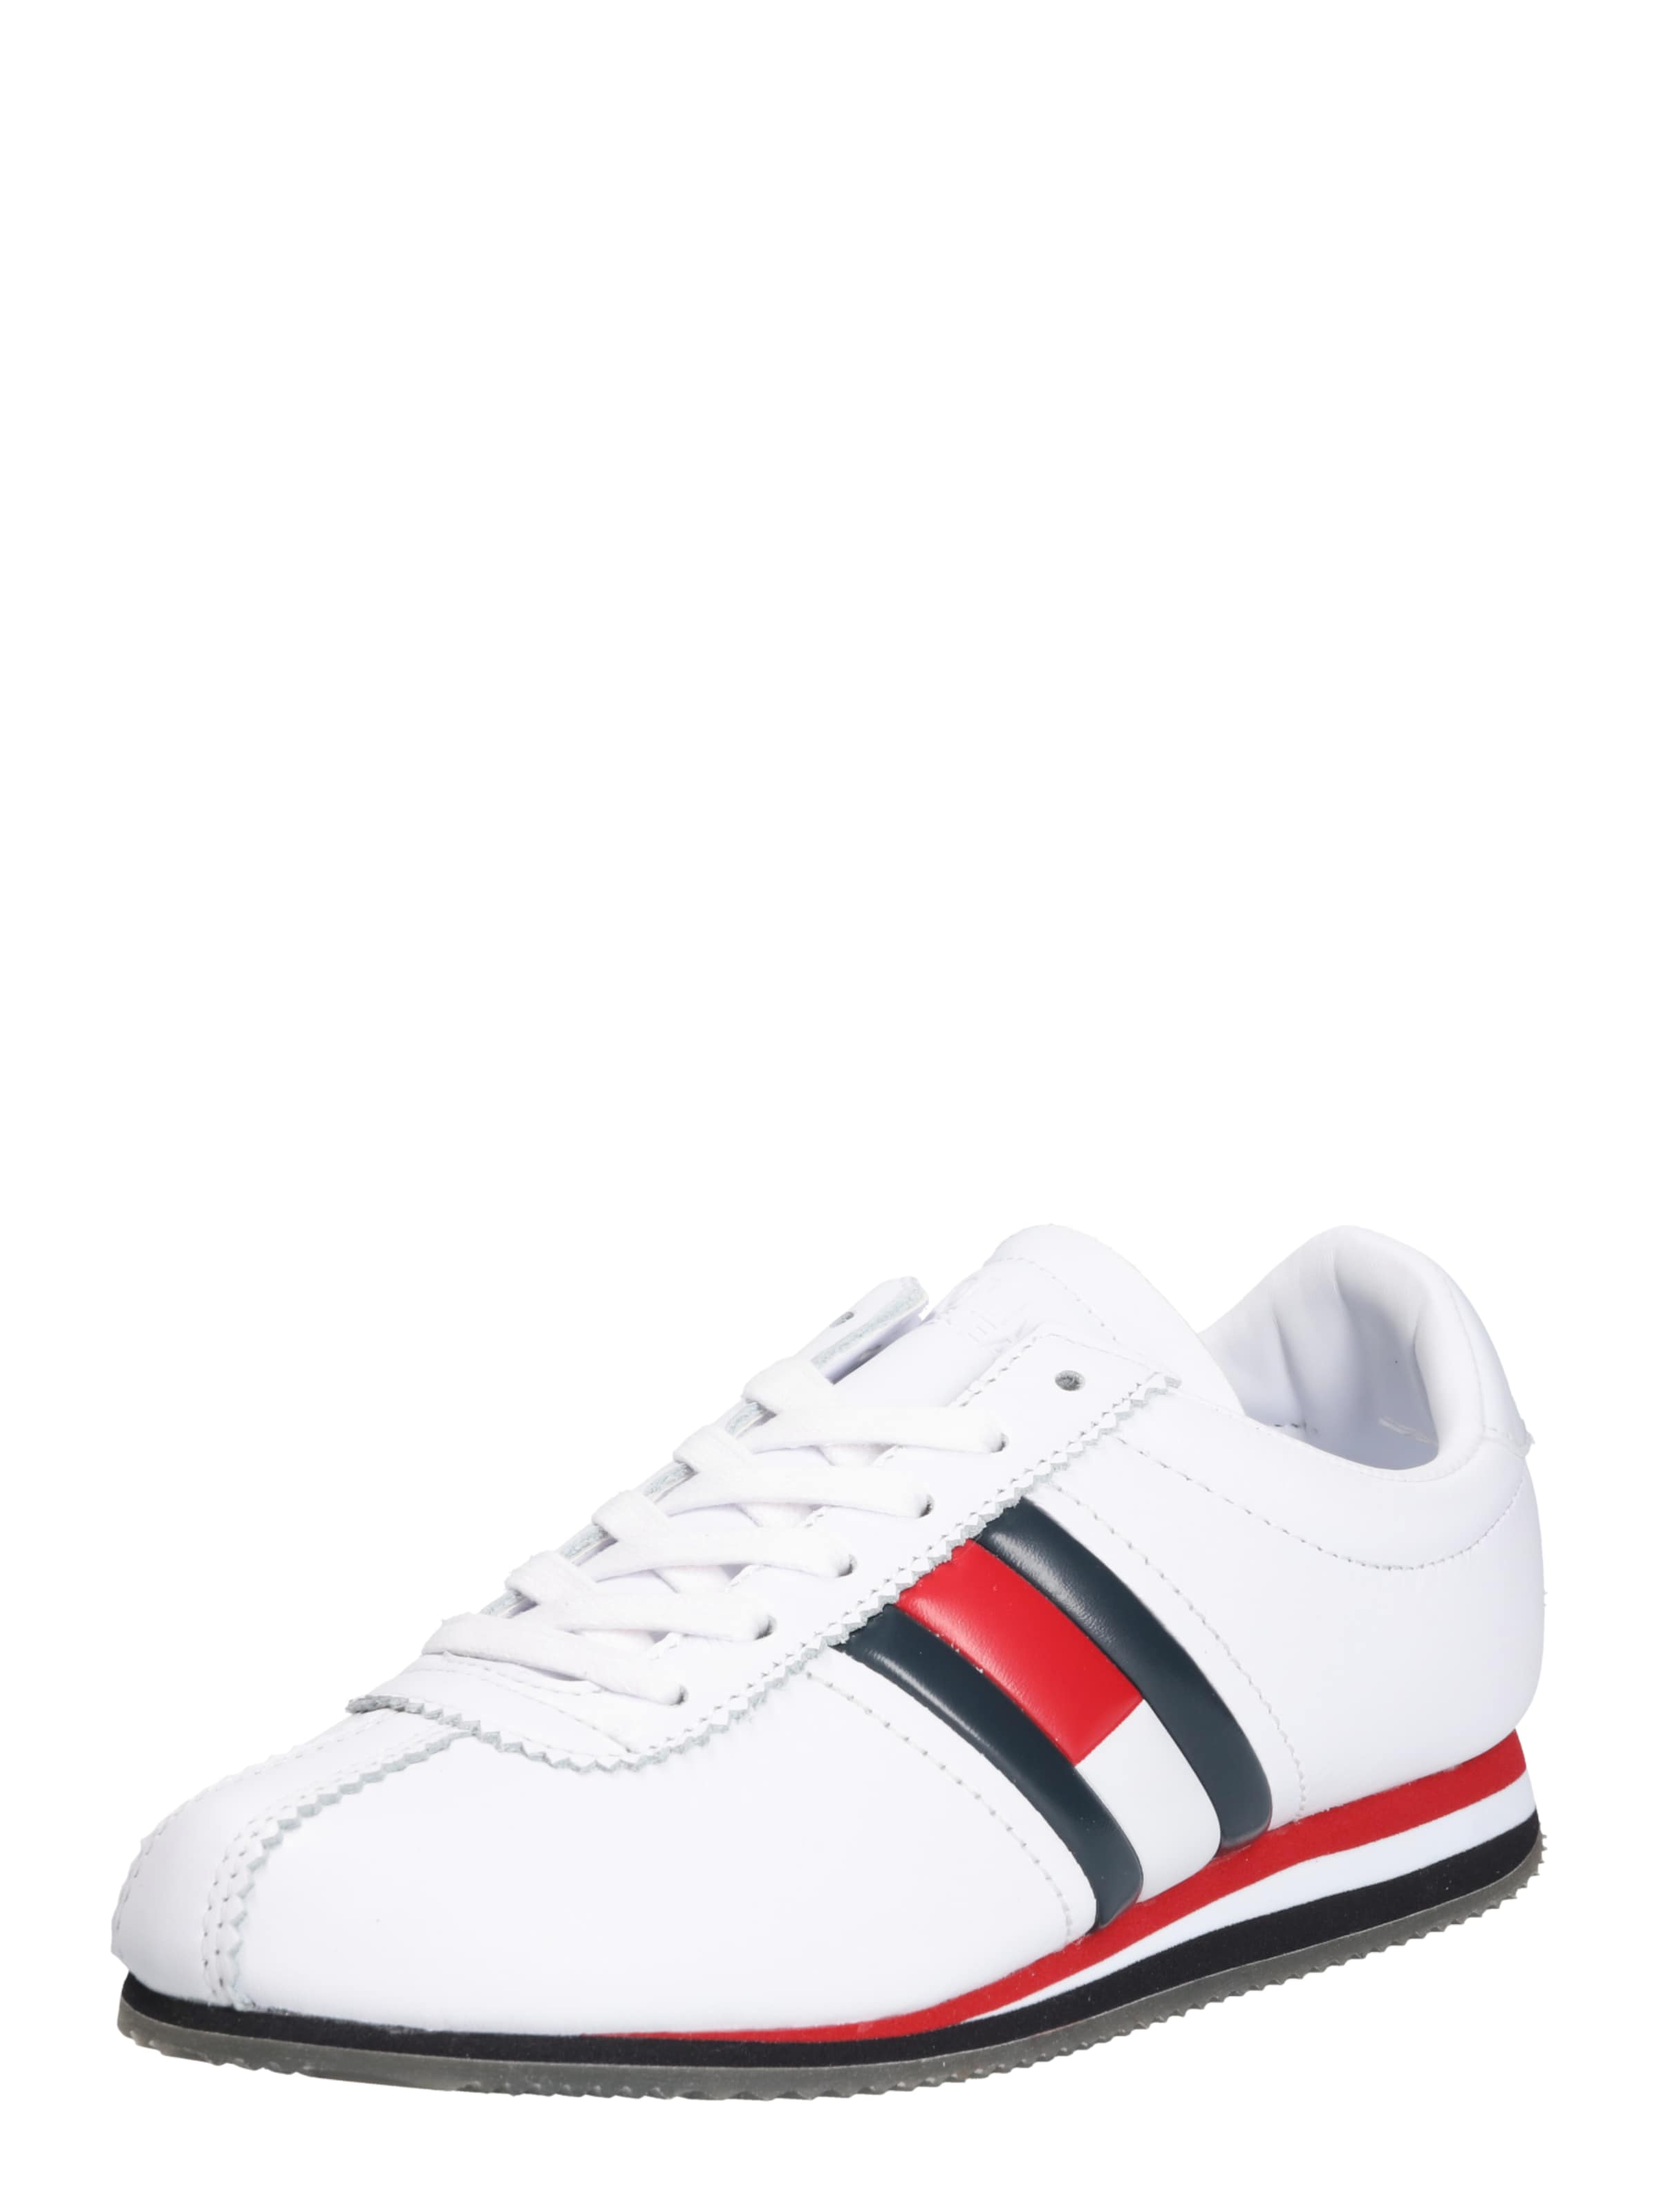 Jeans NavyRot Tommy In Weiß Sneaker 9eWDHIYE2